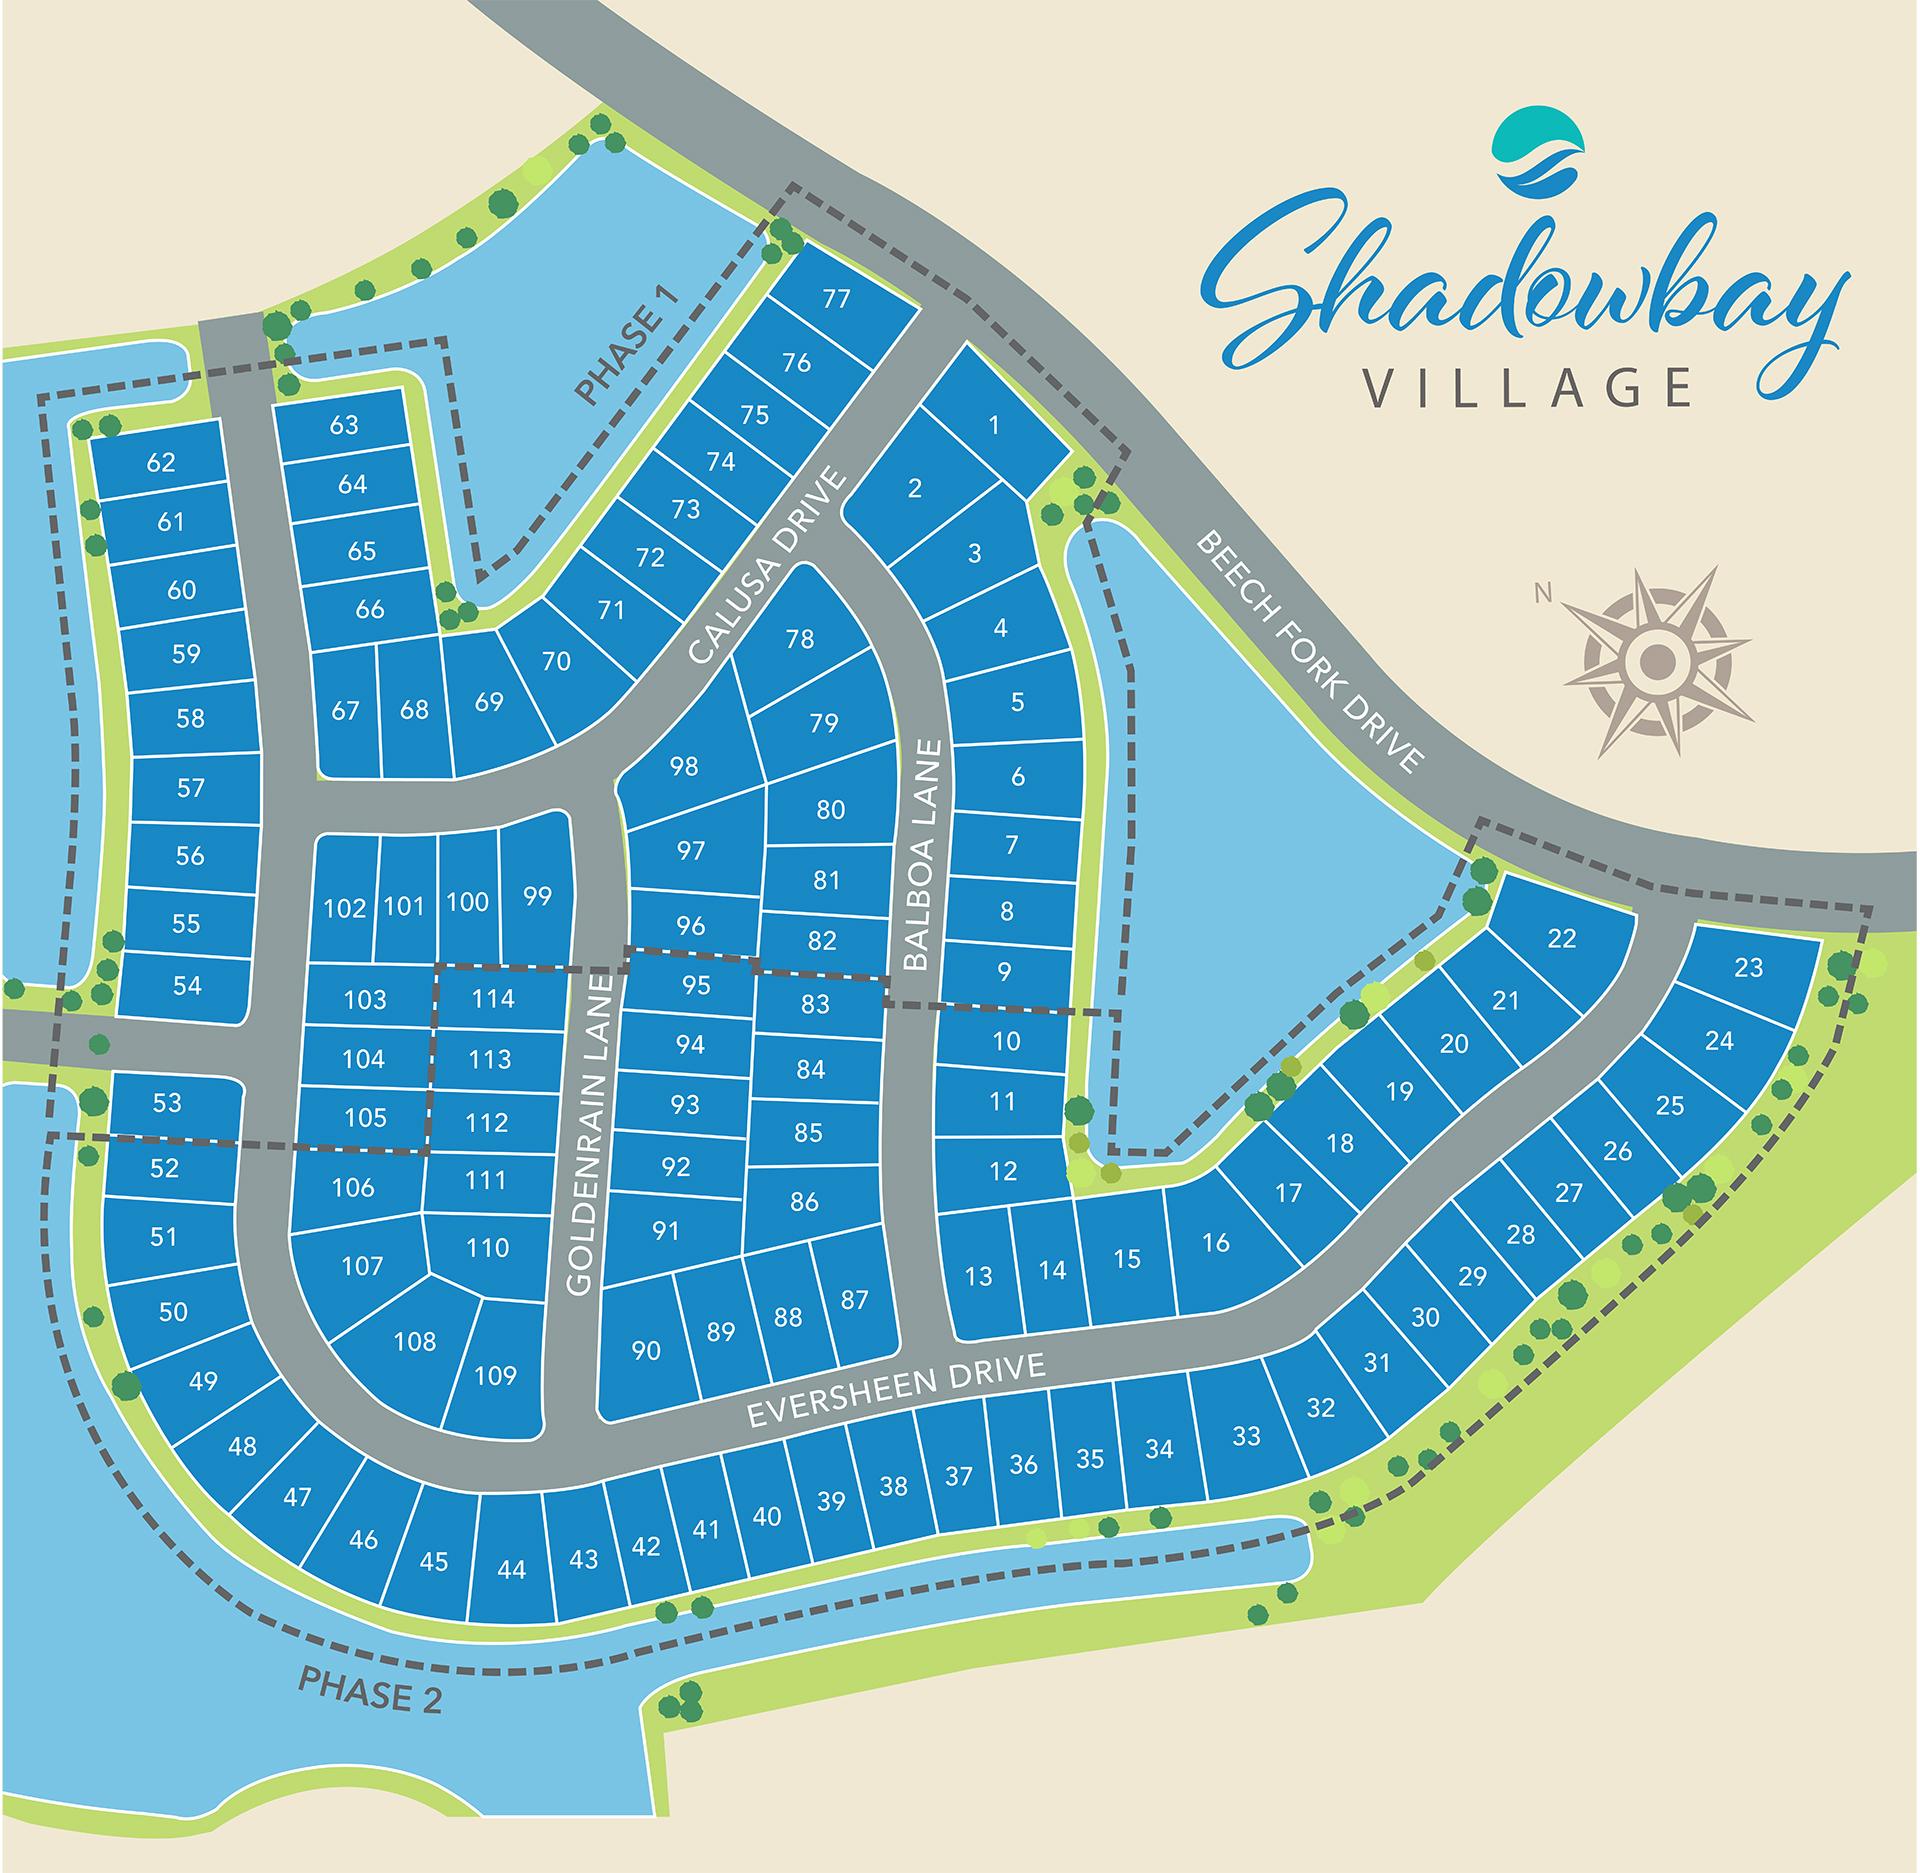 Little River, SC Bridgewater - Shadowbay Village New Homes from Chesapeake